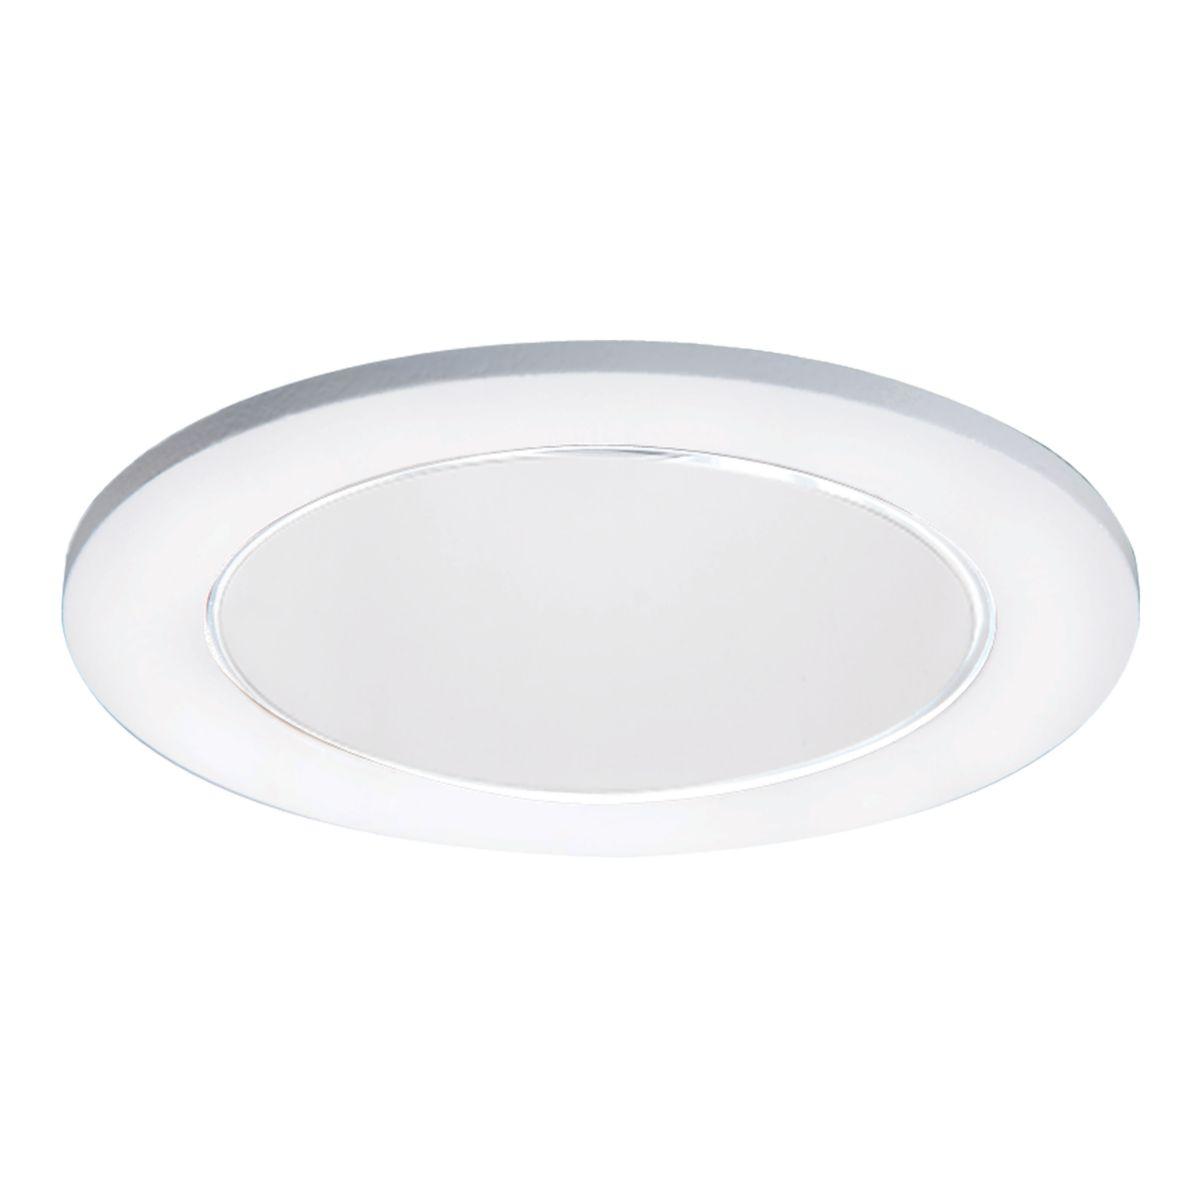 3004 Adjustable Reflector